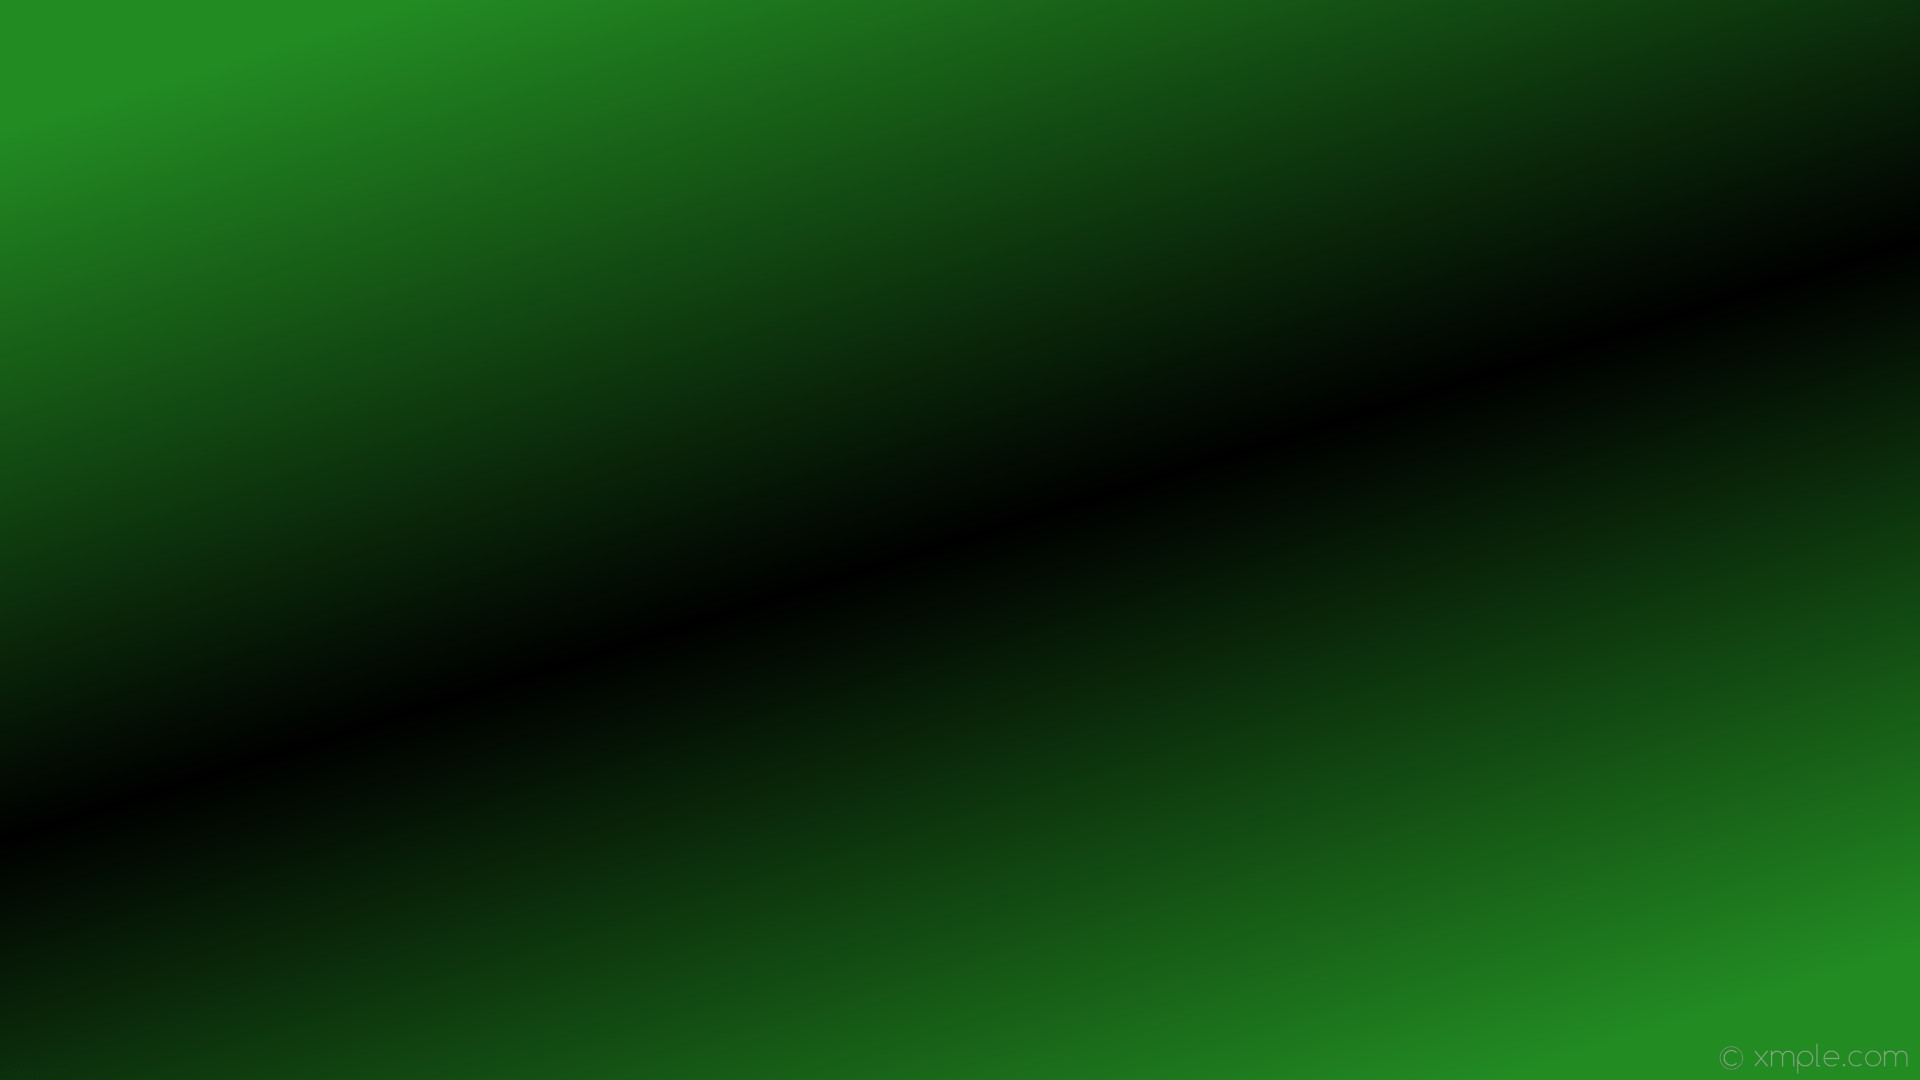 wallpaper linear green black gradient highlight forest green #228b22  #000000 315° 50%